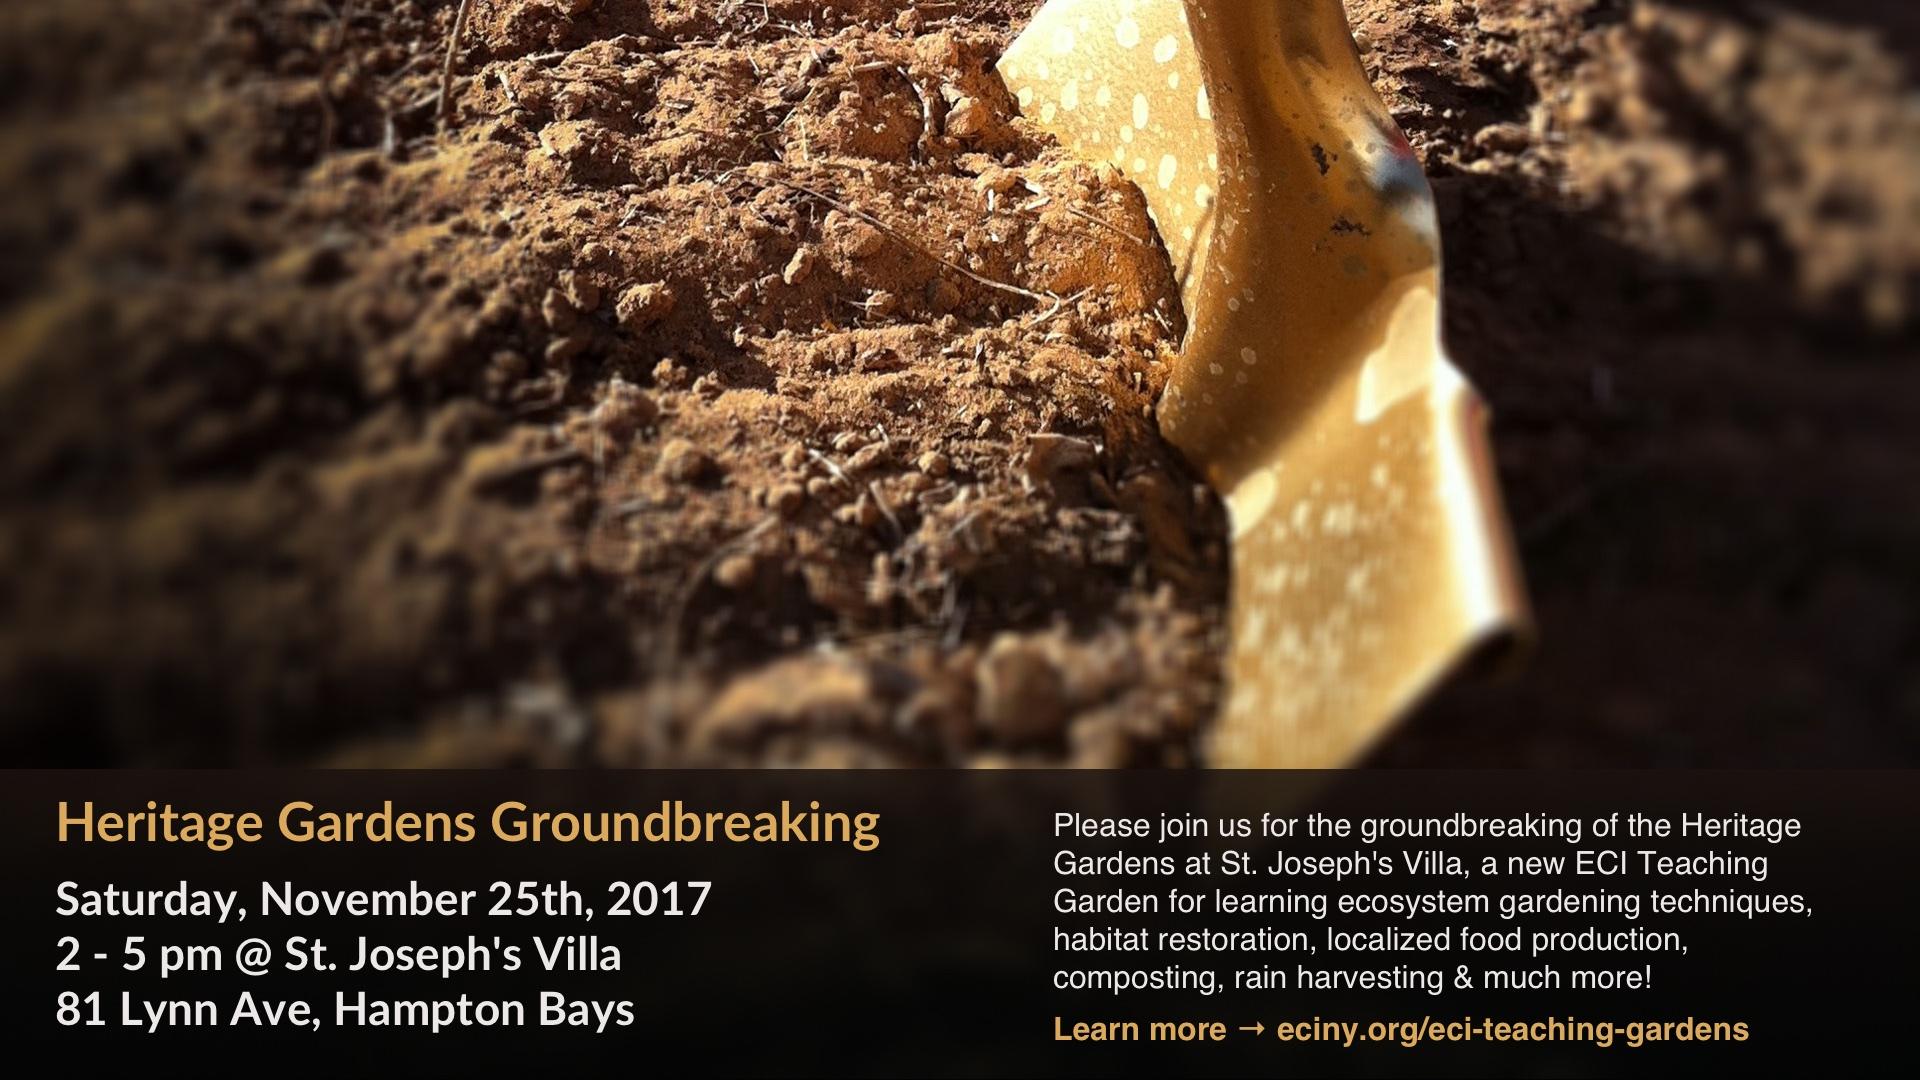 HG Groundbreaking - Nov 25th, 2017 - FB cover 1920x1080.jpg